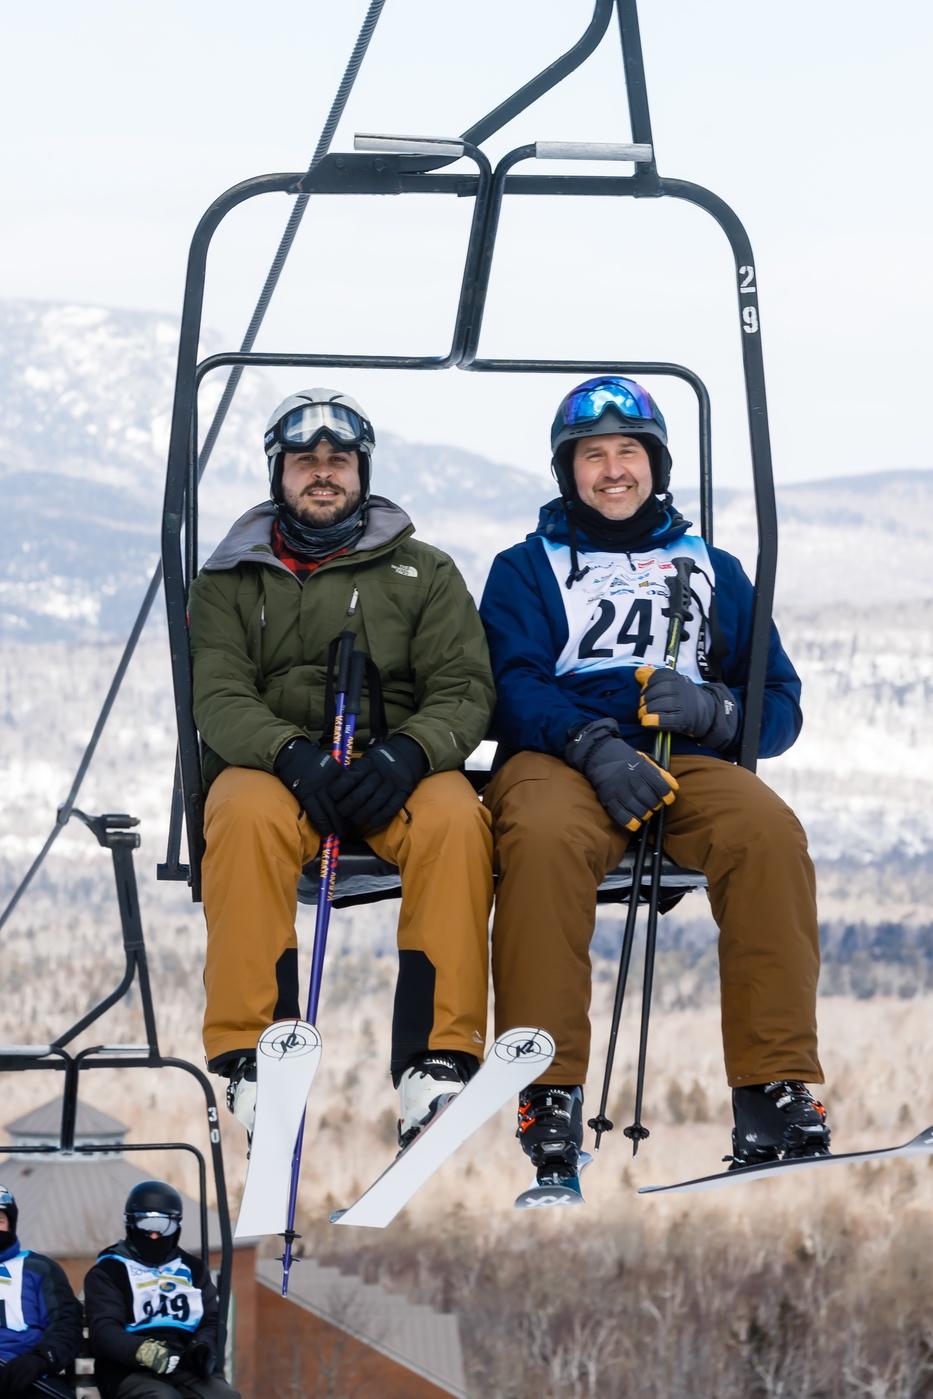 WinterKids Downhill 24 2021 SDP 3469